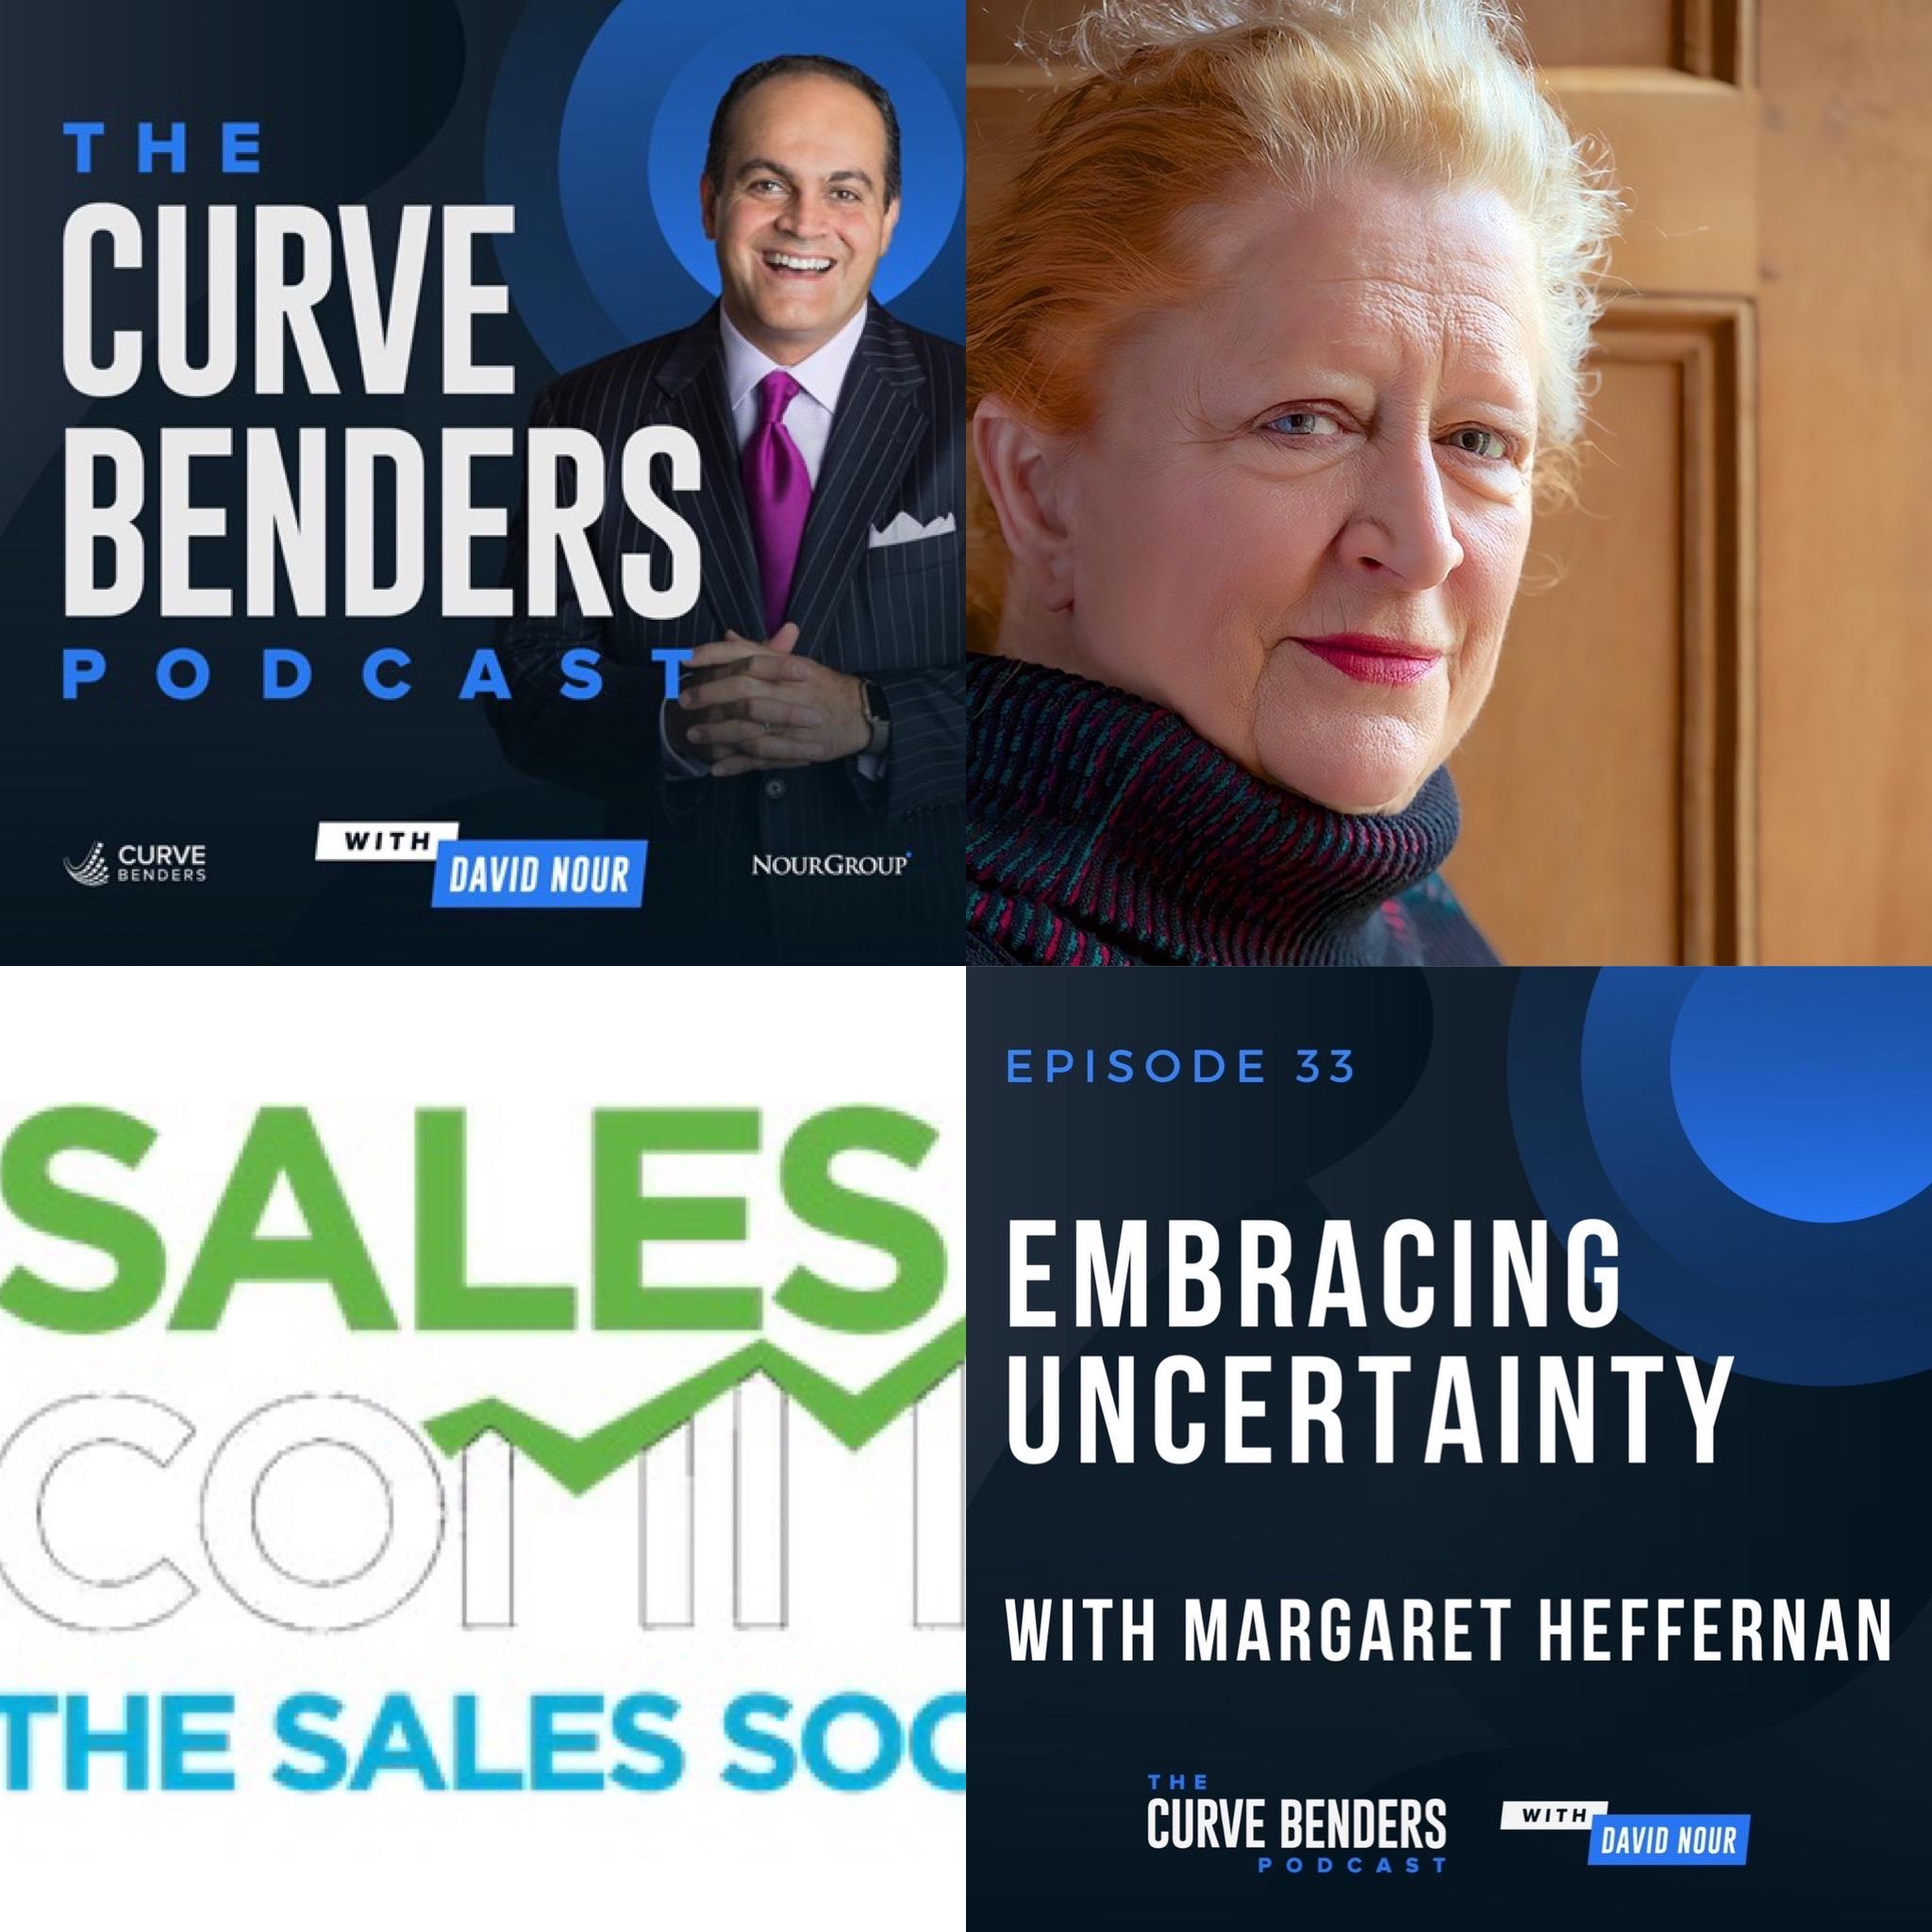 Curve Benders Podcast – Embracing Uncertainty with Margaret Heffernan